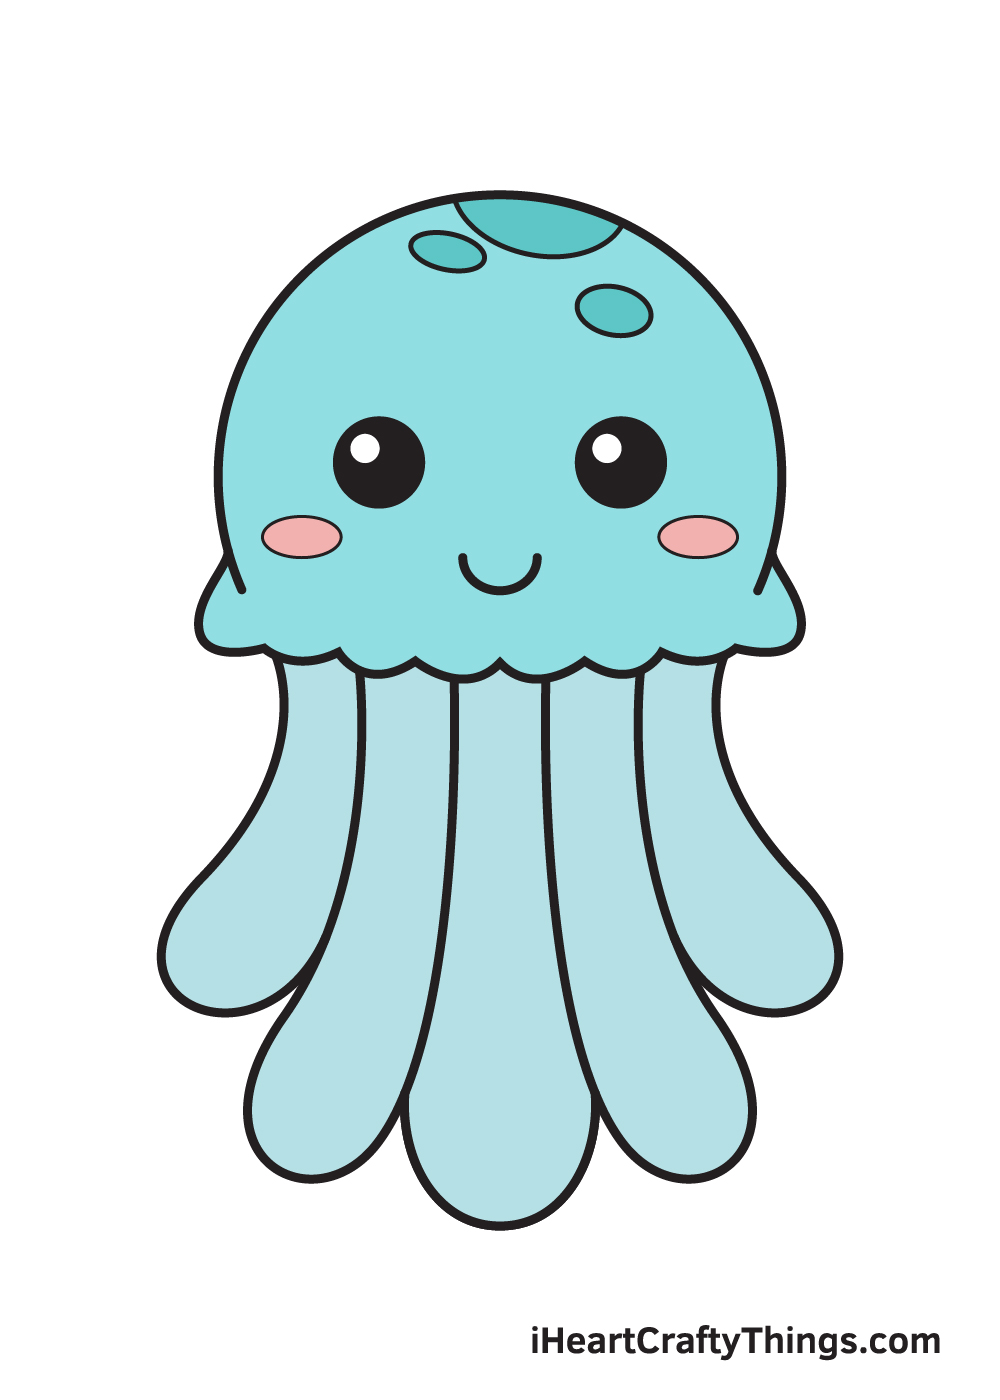 jellyfish drawing 9 steps